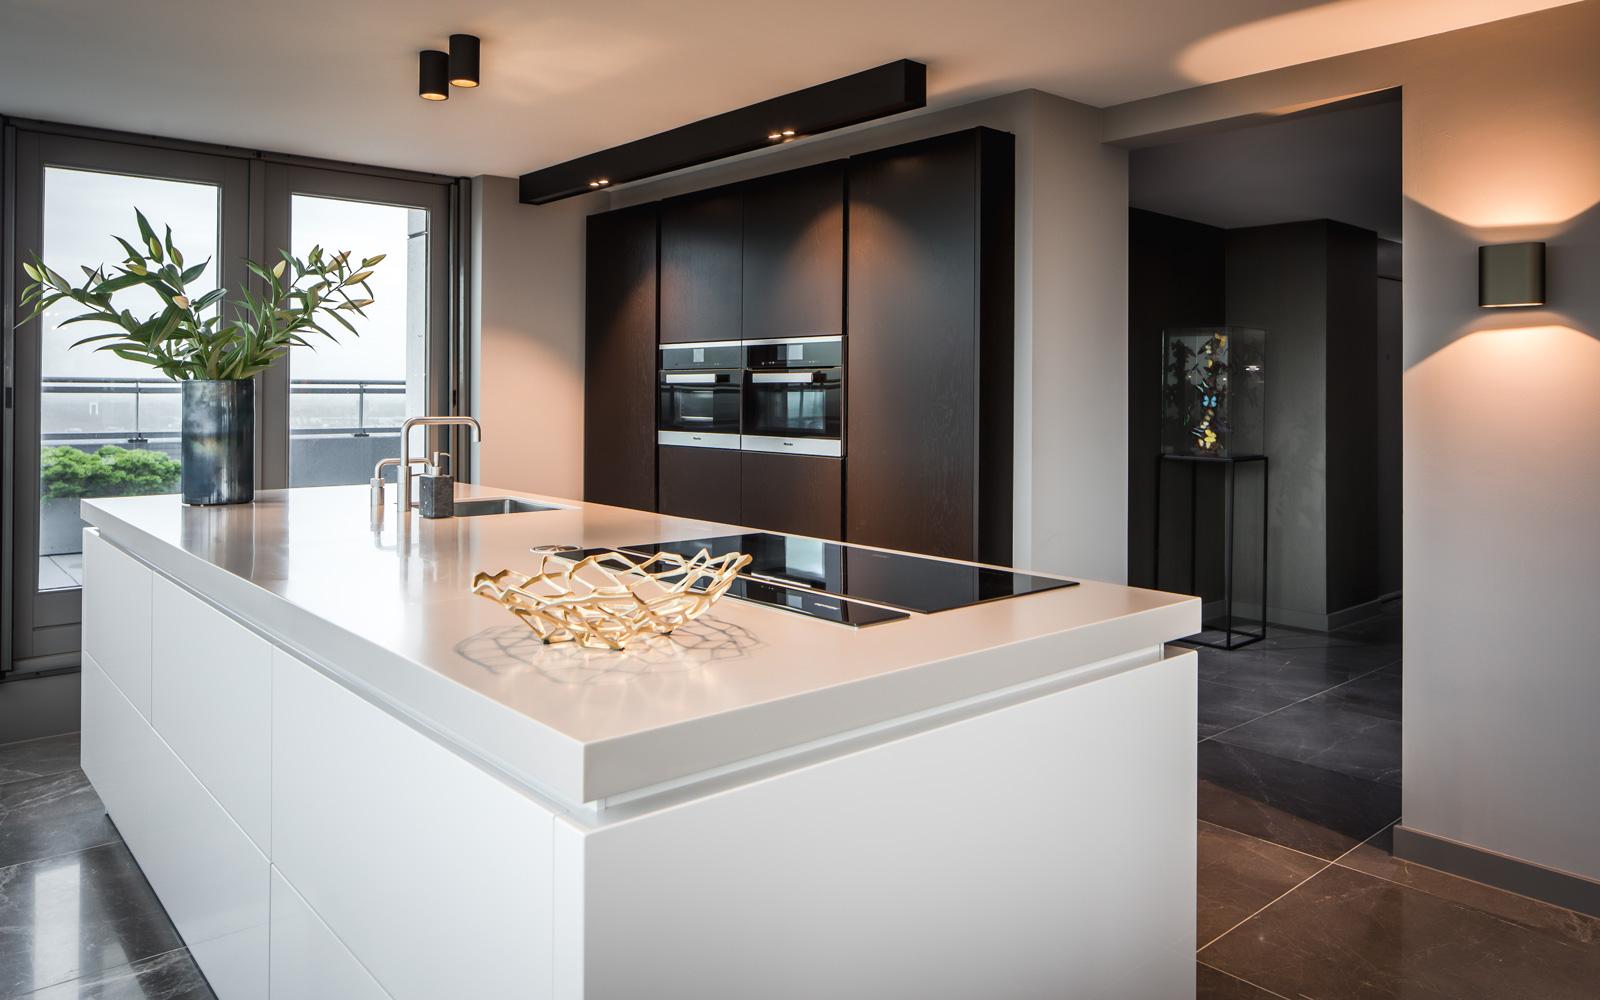 Keuken op maat, Iemms Keukens en Interieur